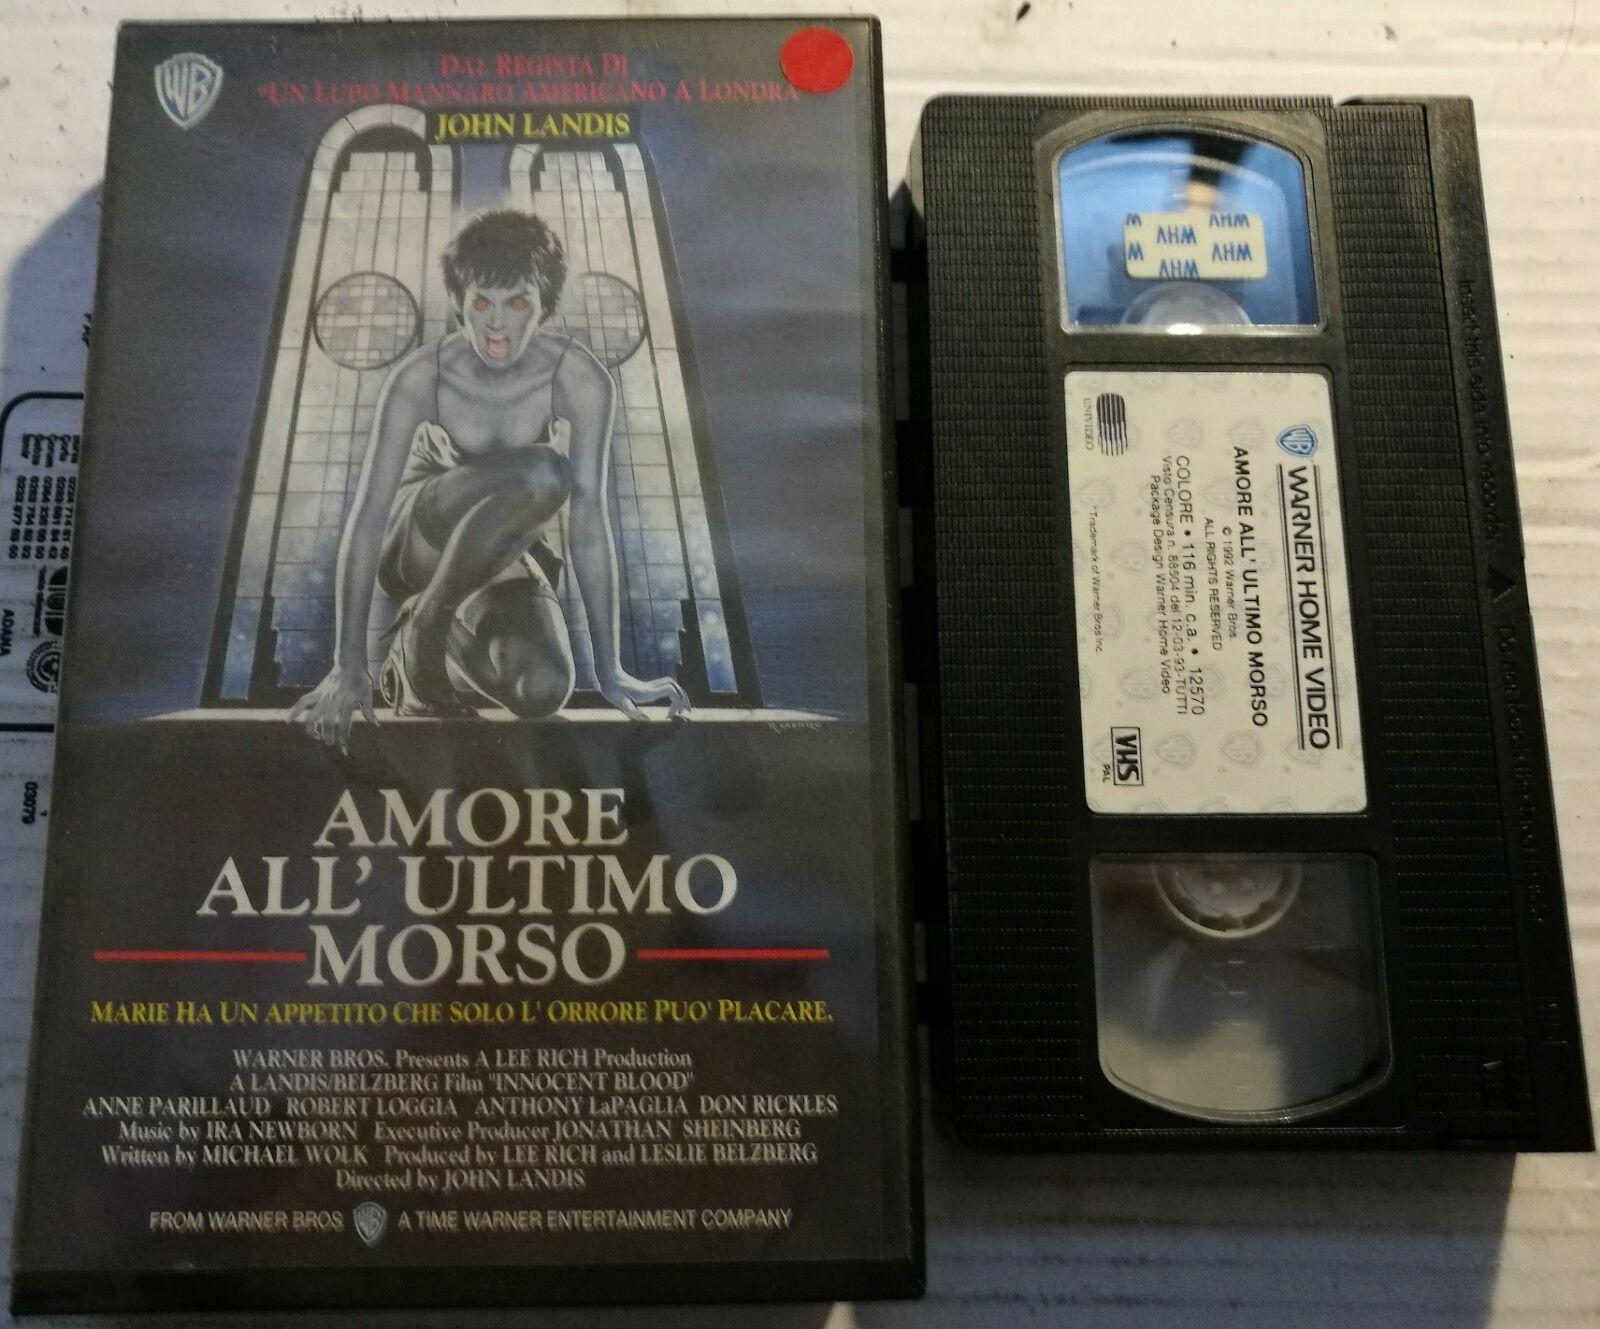 AMORE ALL'ULTIMO MORSO - VHS EX NOLEGGIO (VHS)